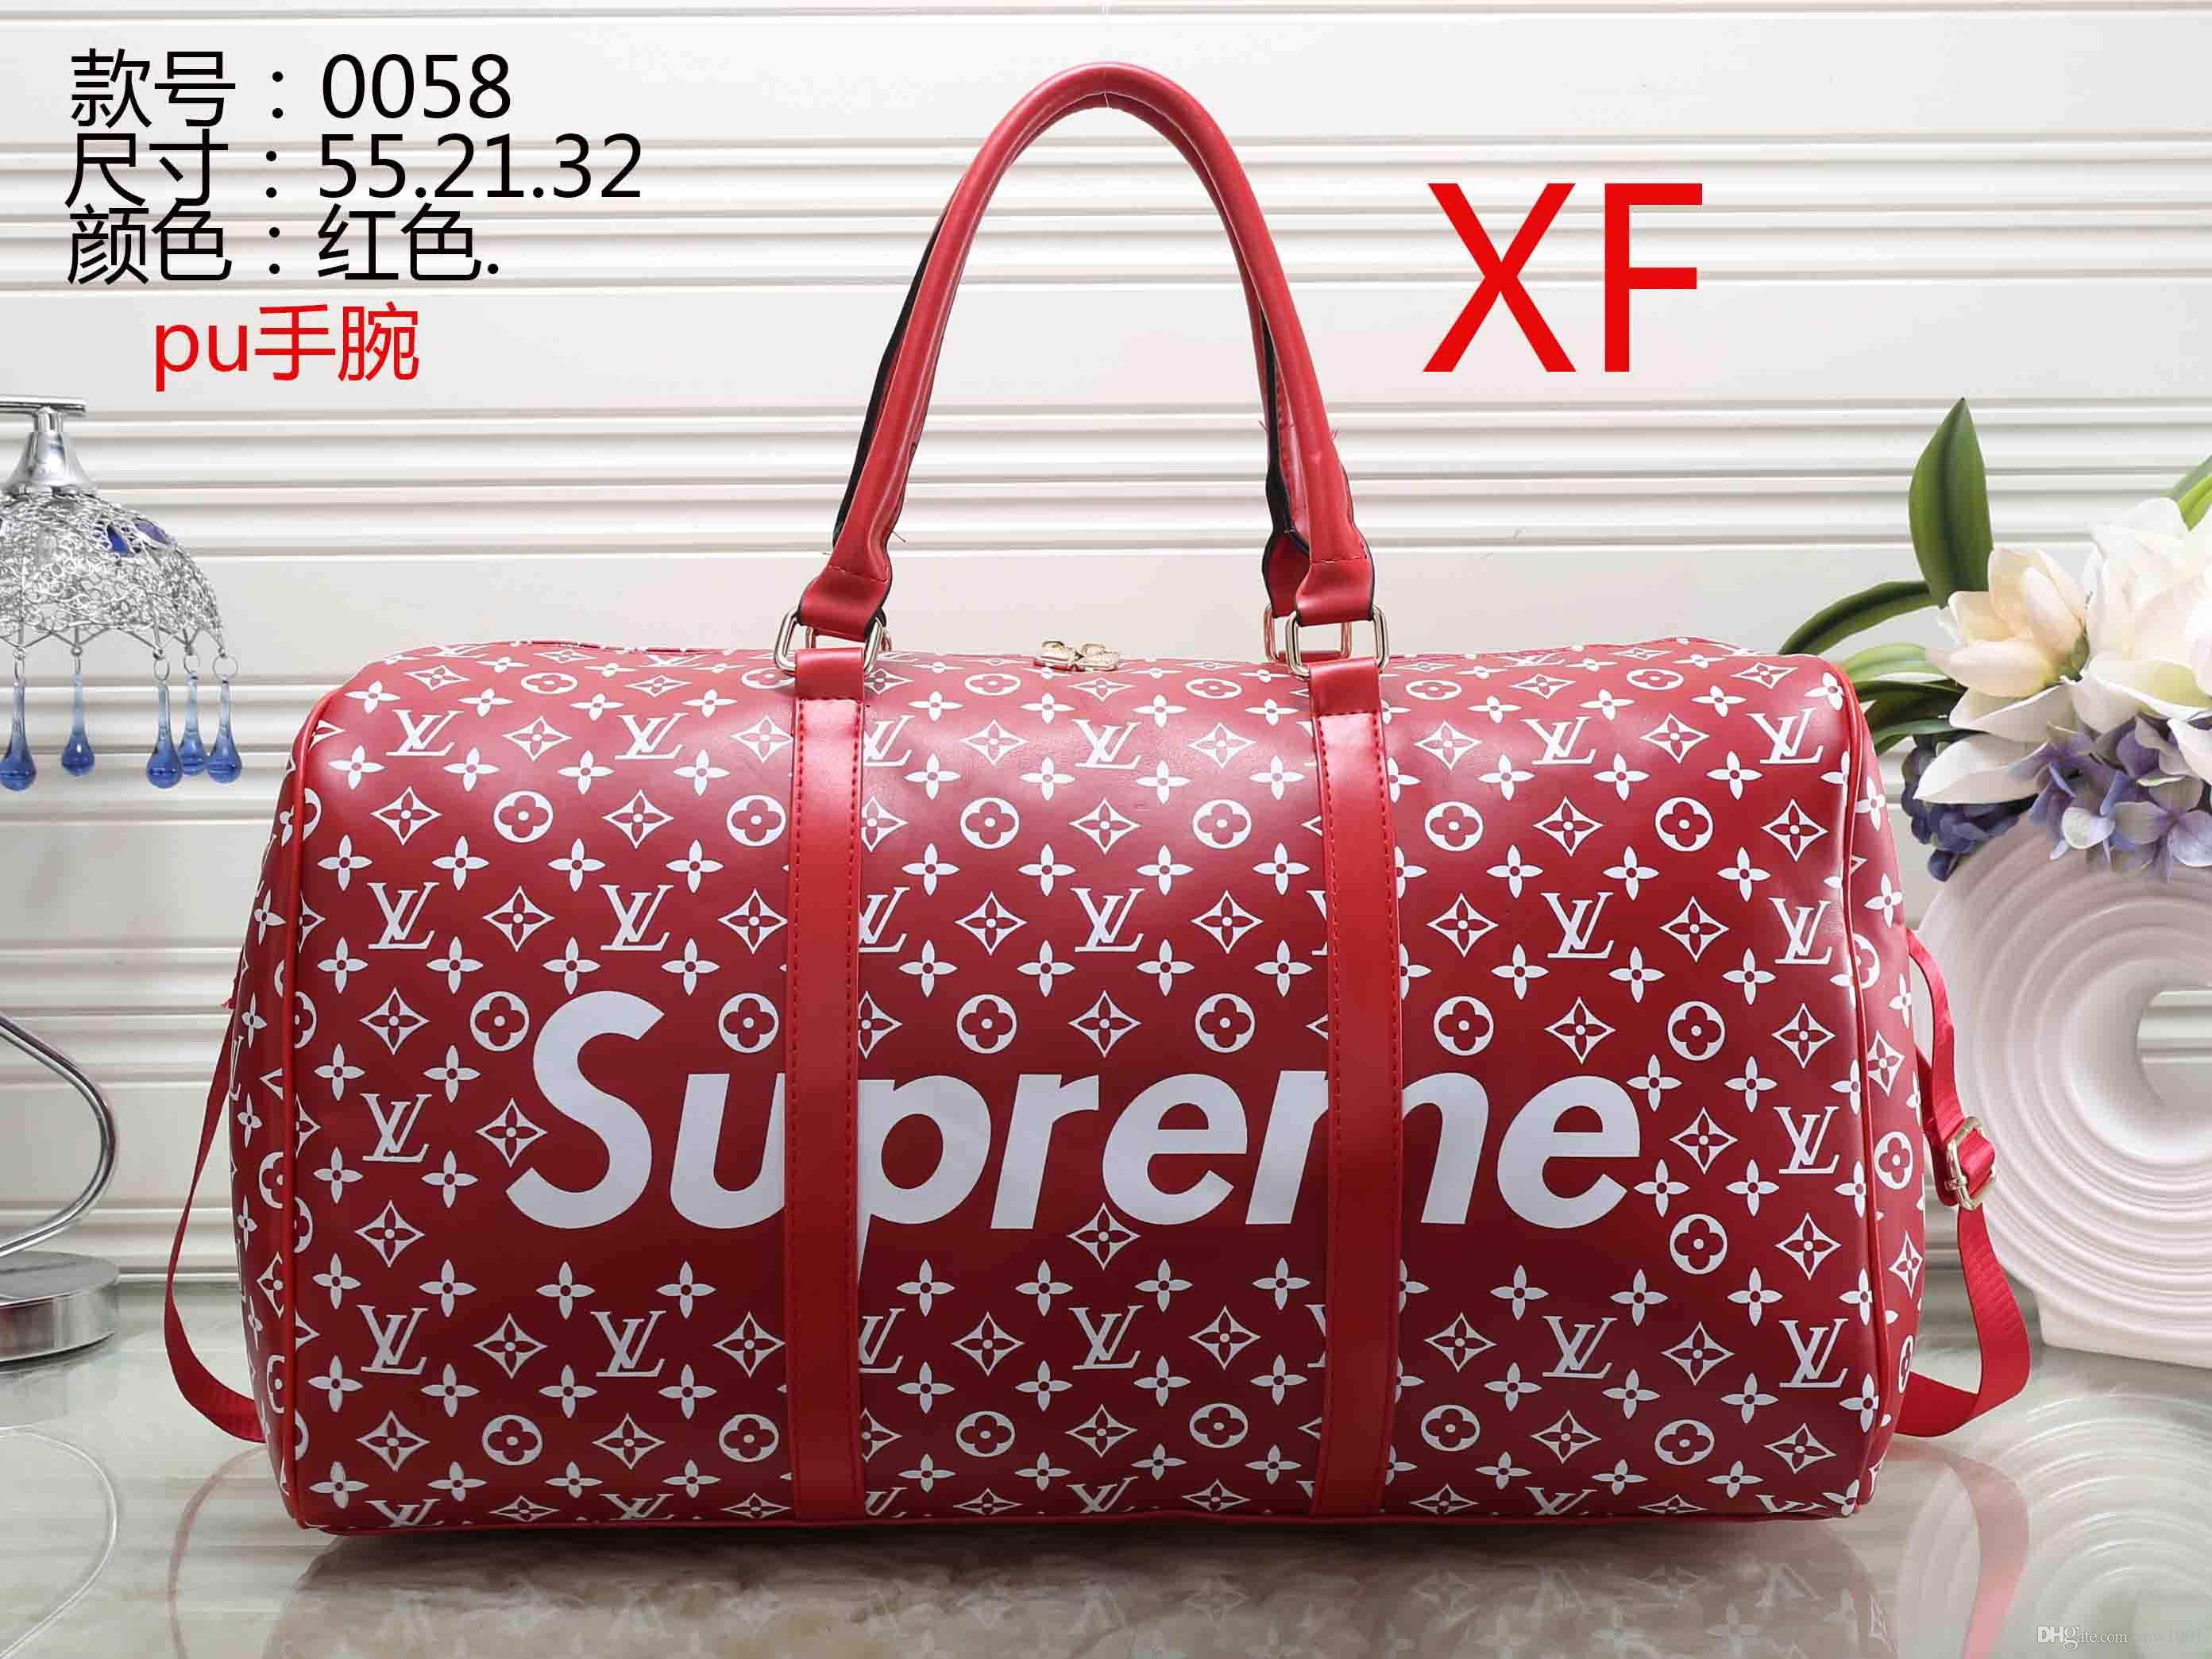 NEW Luxury Handbags Totes Fashion Women Bags Designer Bags Handbag Women  Famous Brand Sac A Main Small Shell 2018 Desginer Handbags Bags A05 Women  Handbag ... 942b8cda50b93